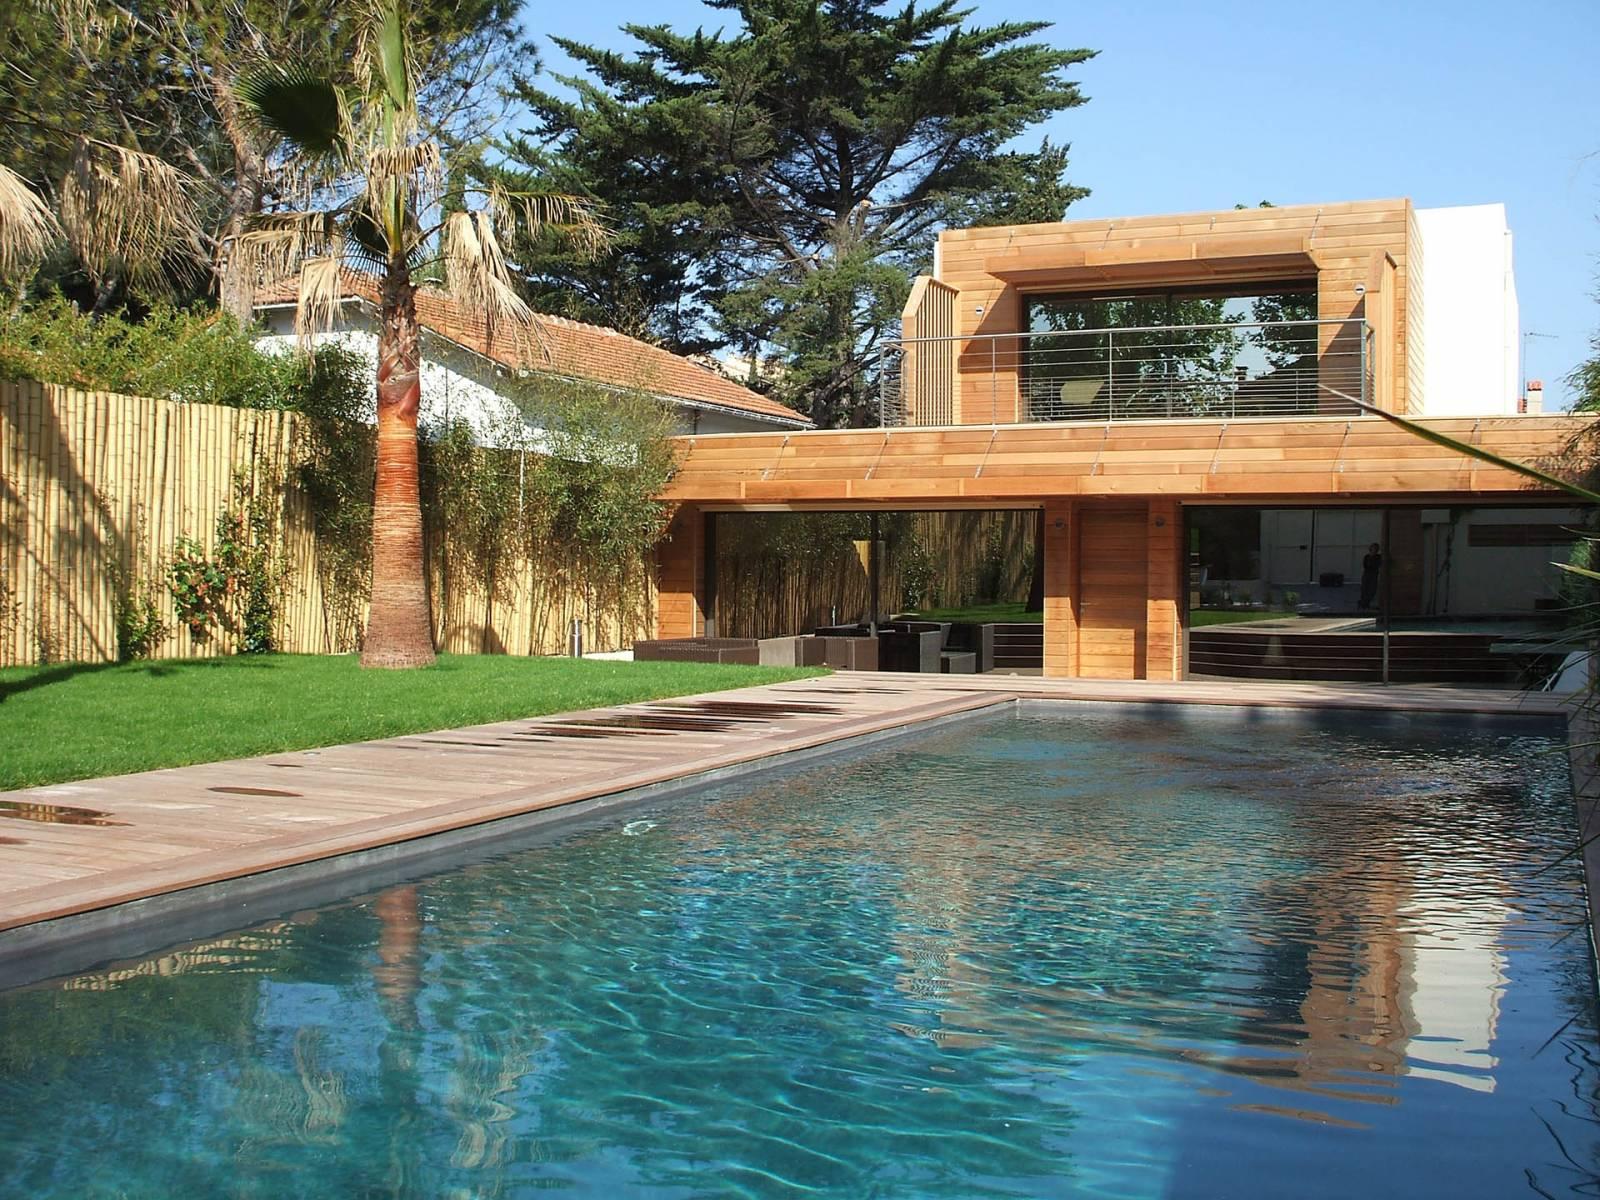 terrasse en bois parquet plage de piscine marseille terrasses meynier. Black Bedroom Furniture Sets. Home Design Ideas